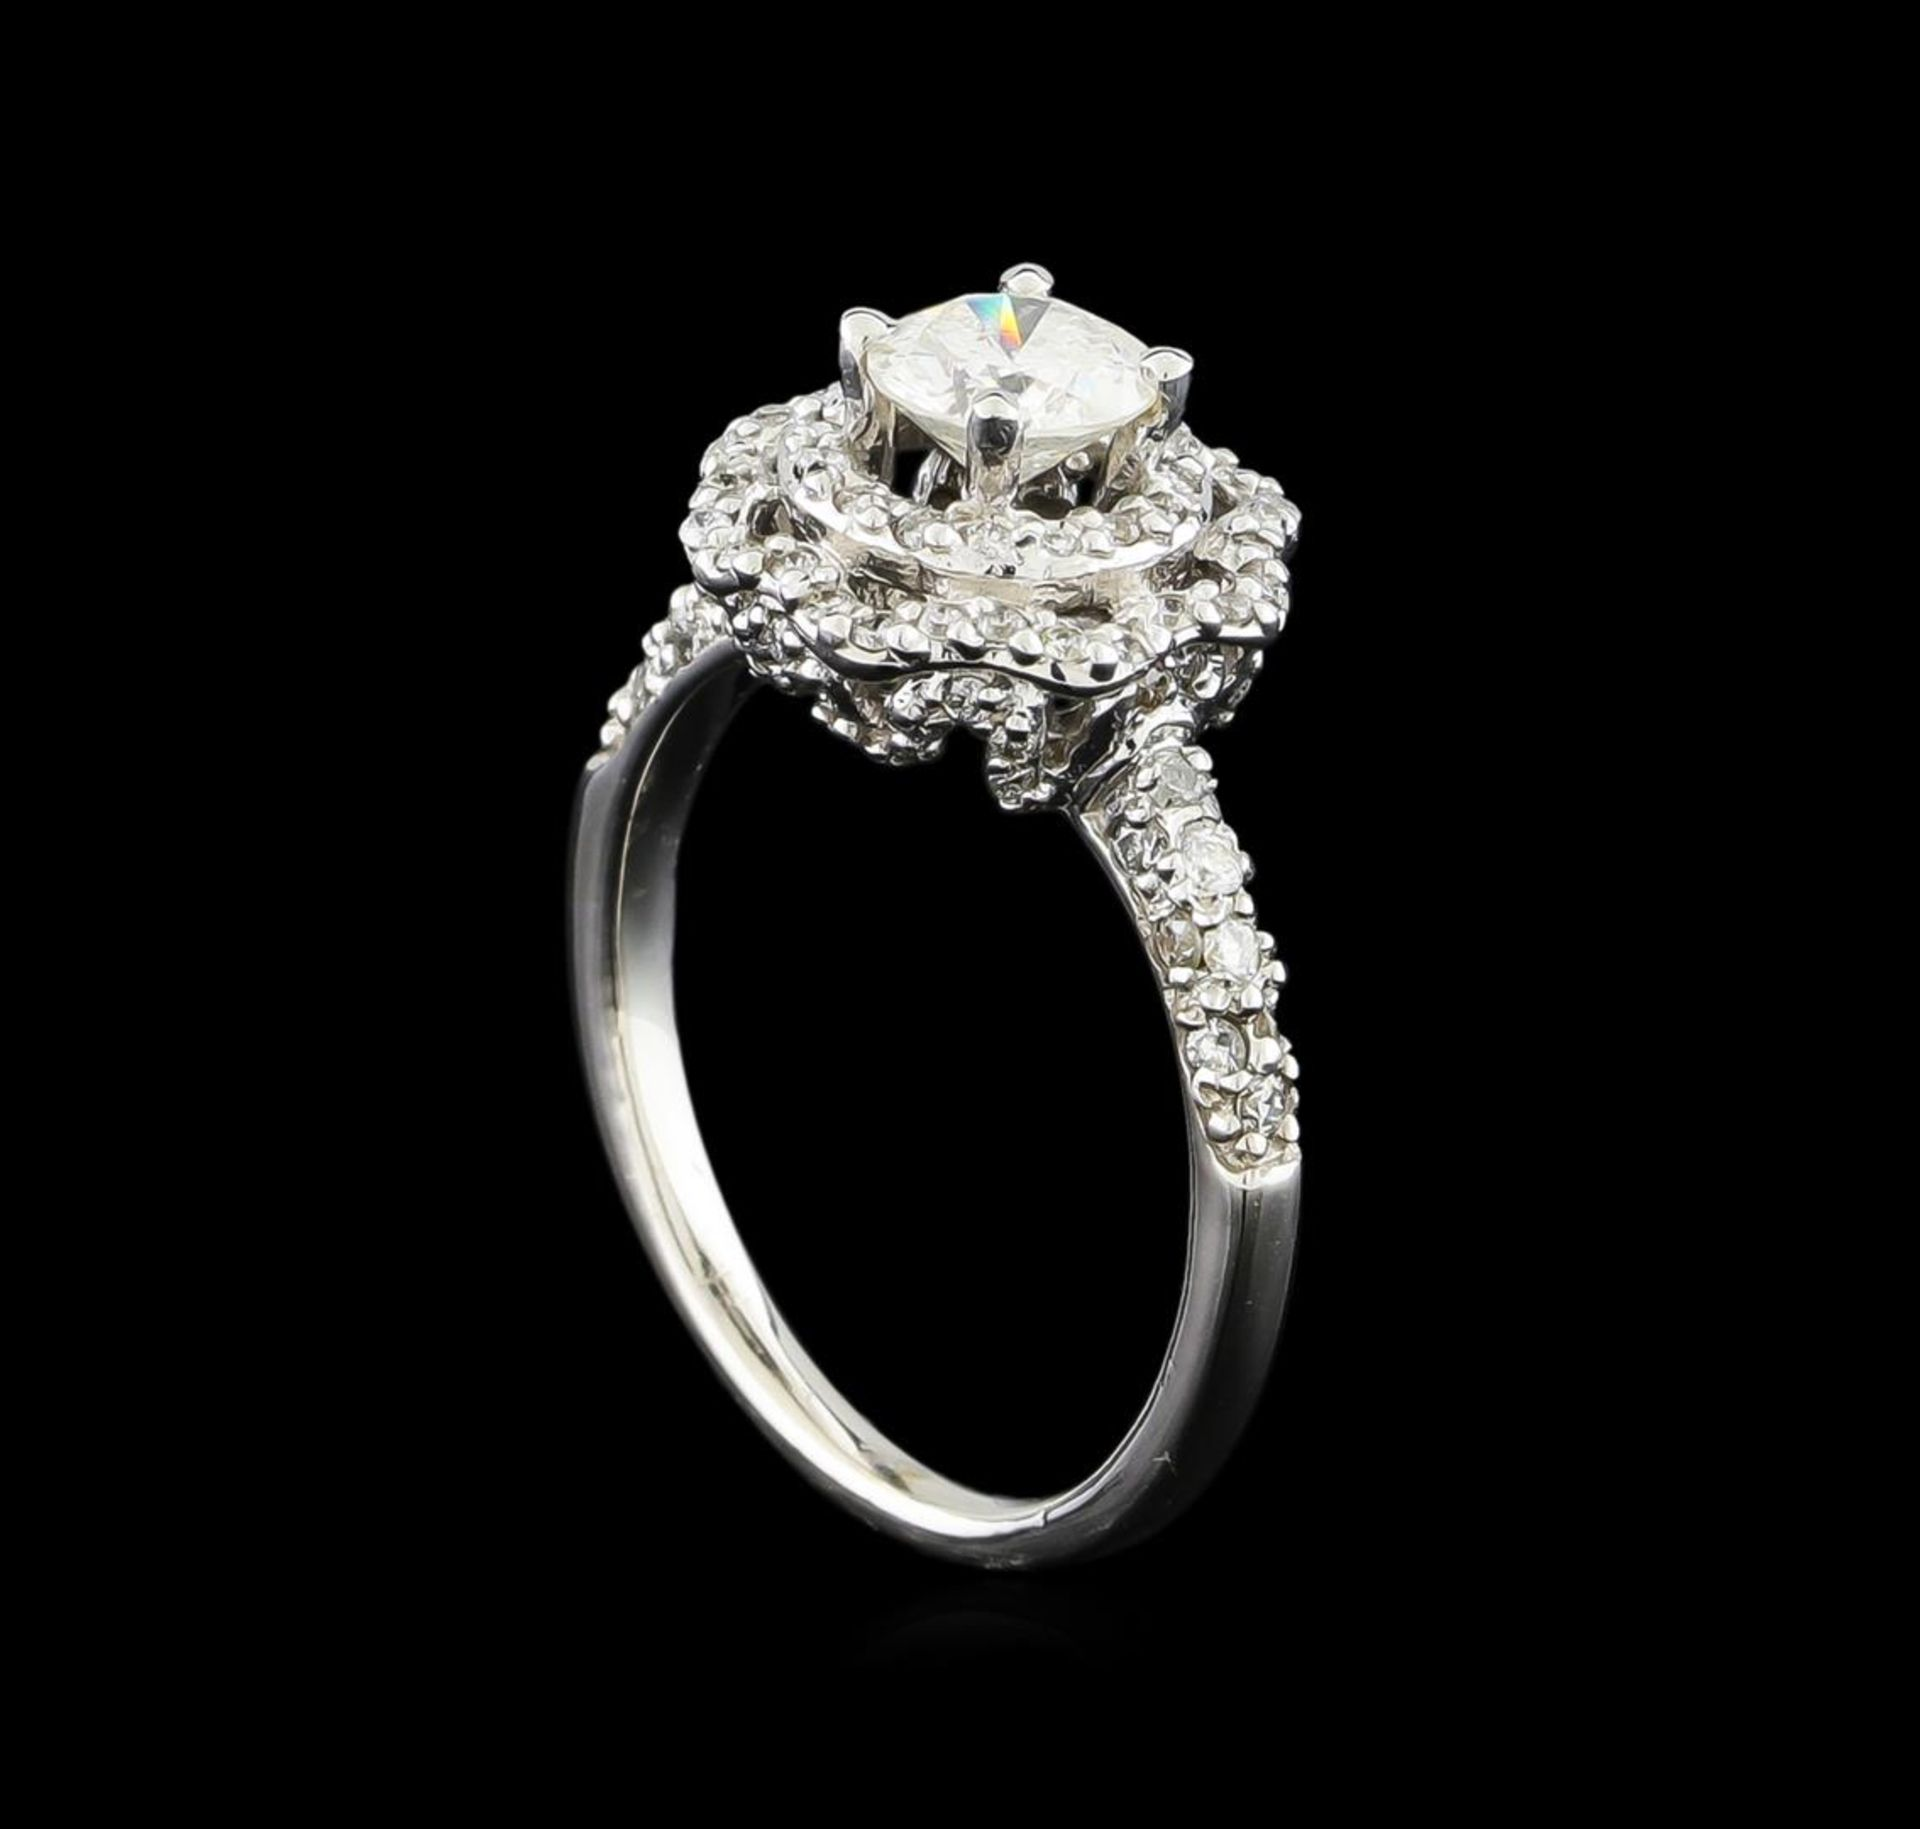 14KT White Gold 0.95 ctw Diamond Ring - Image 4 of 5